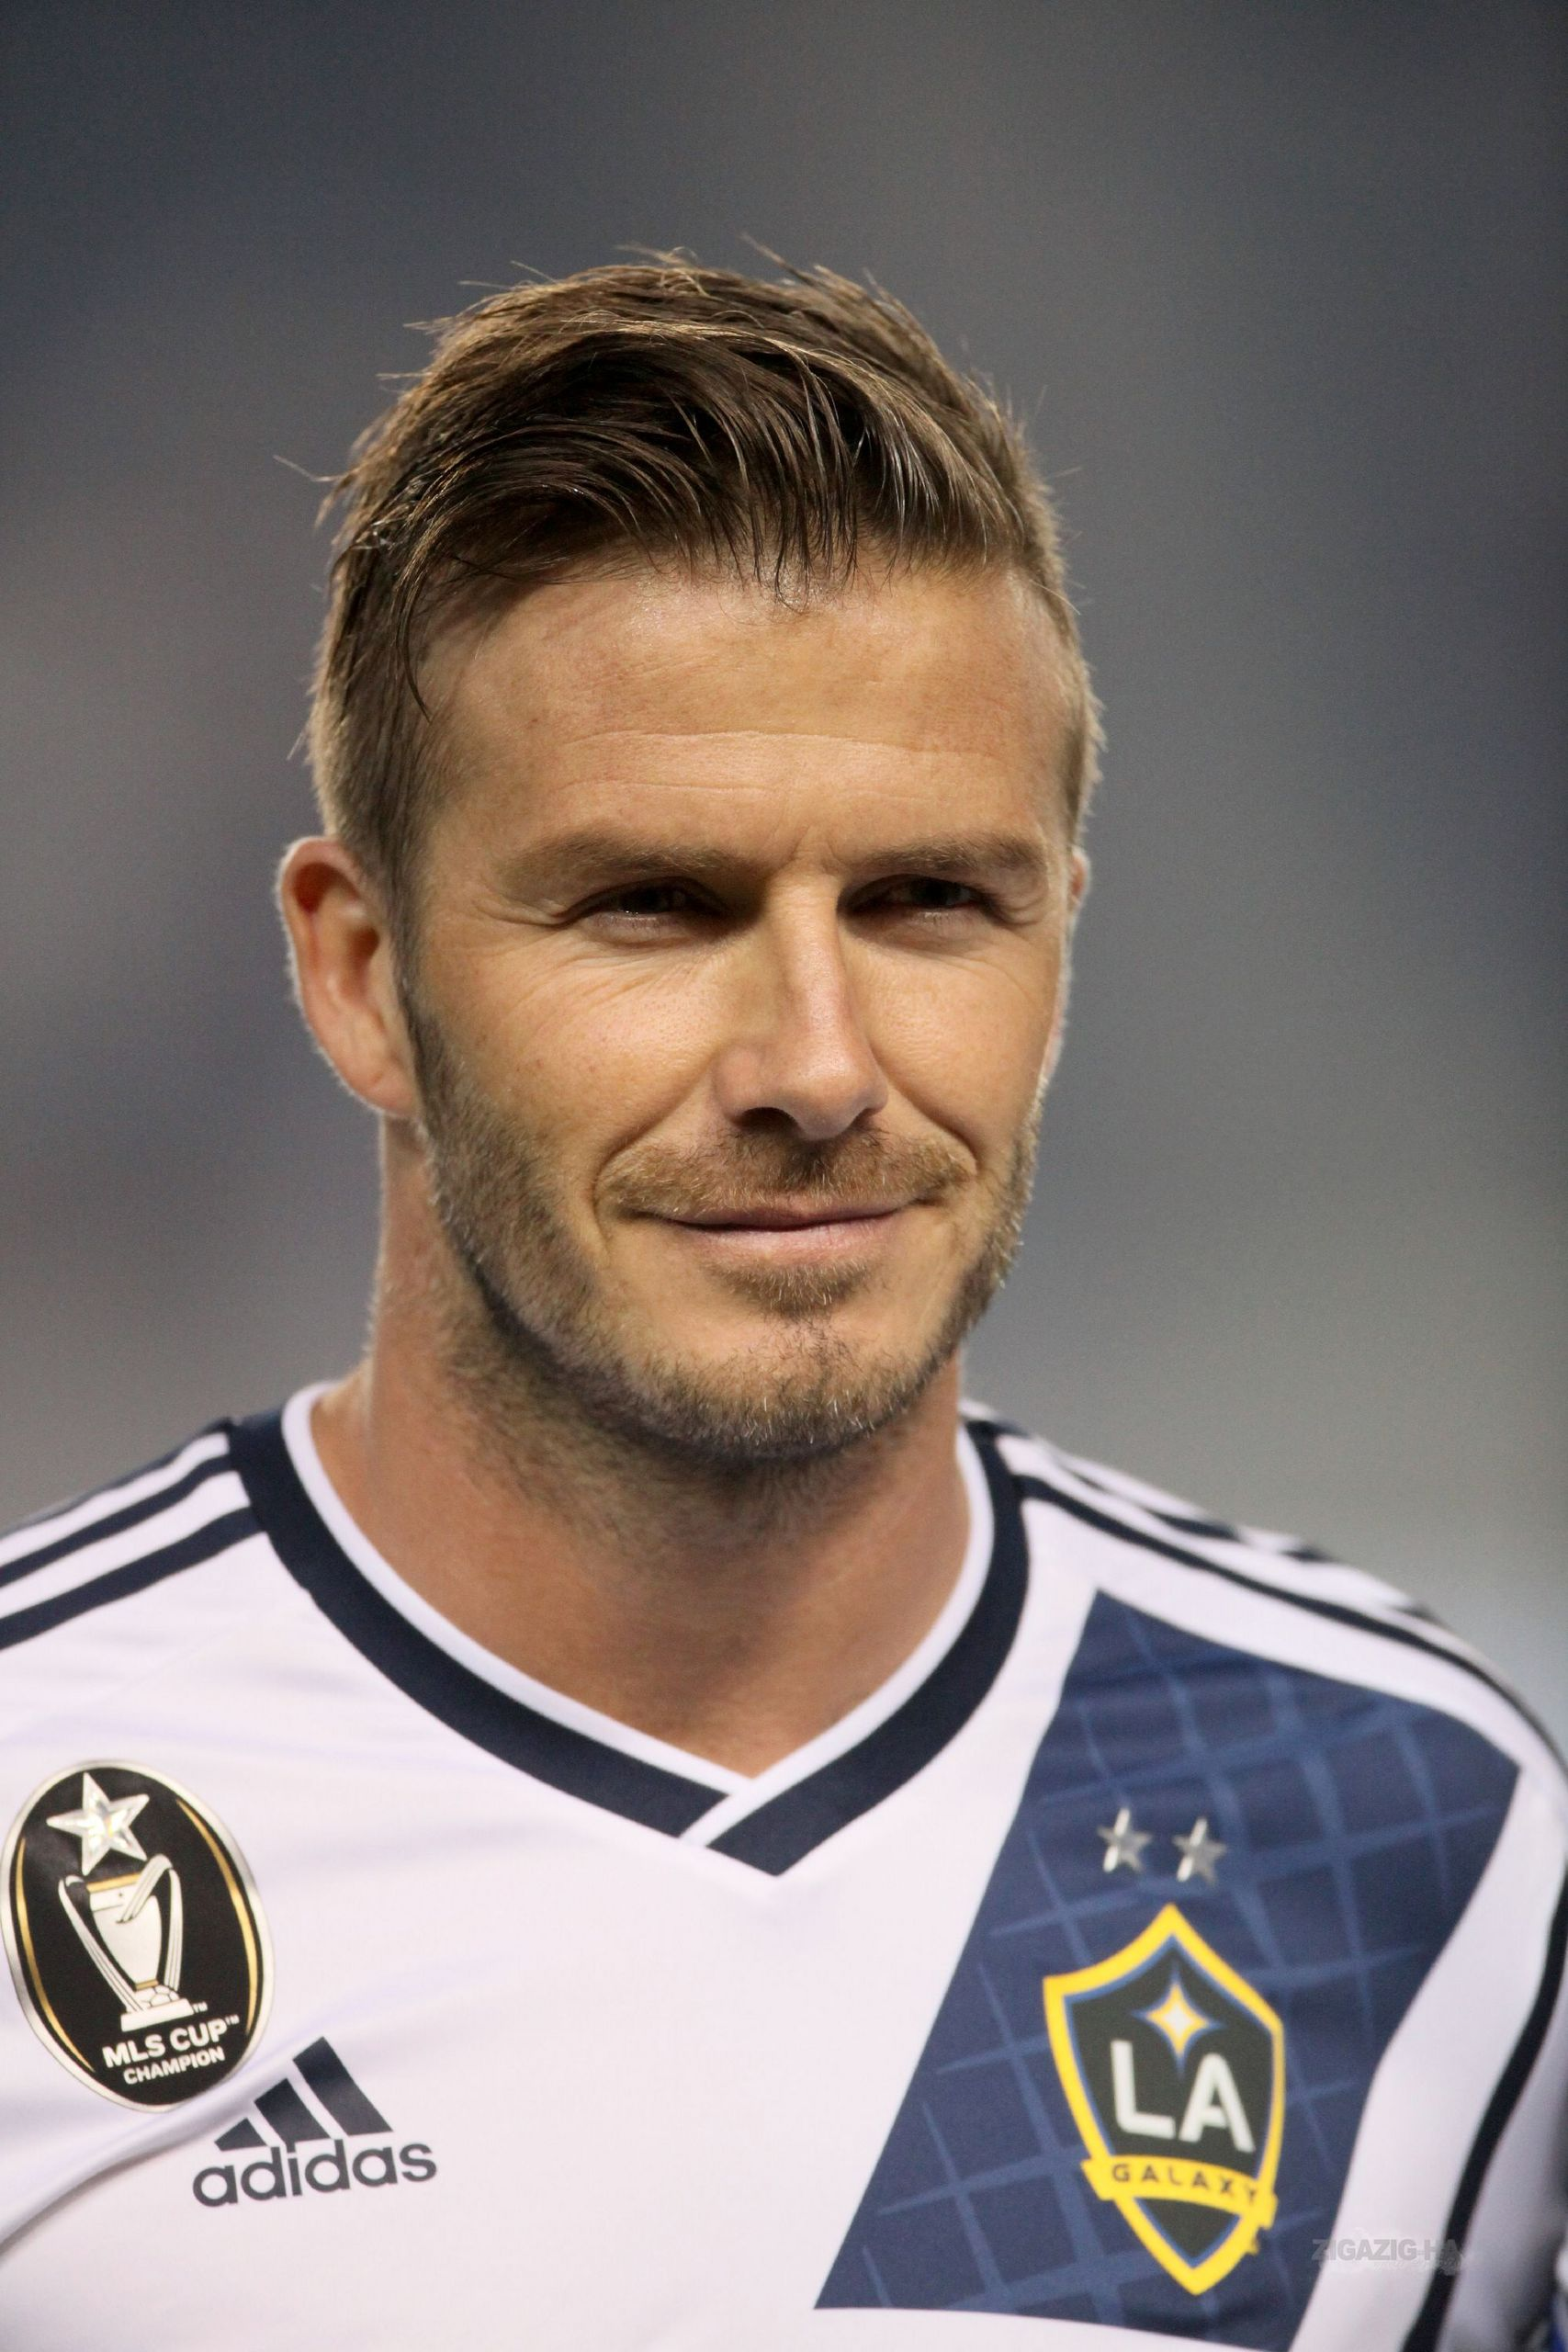 David-Beckham-New-Hairstyle-2012-david-beckham-30515174-1707-2560